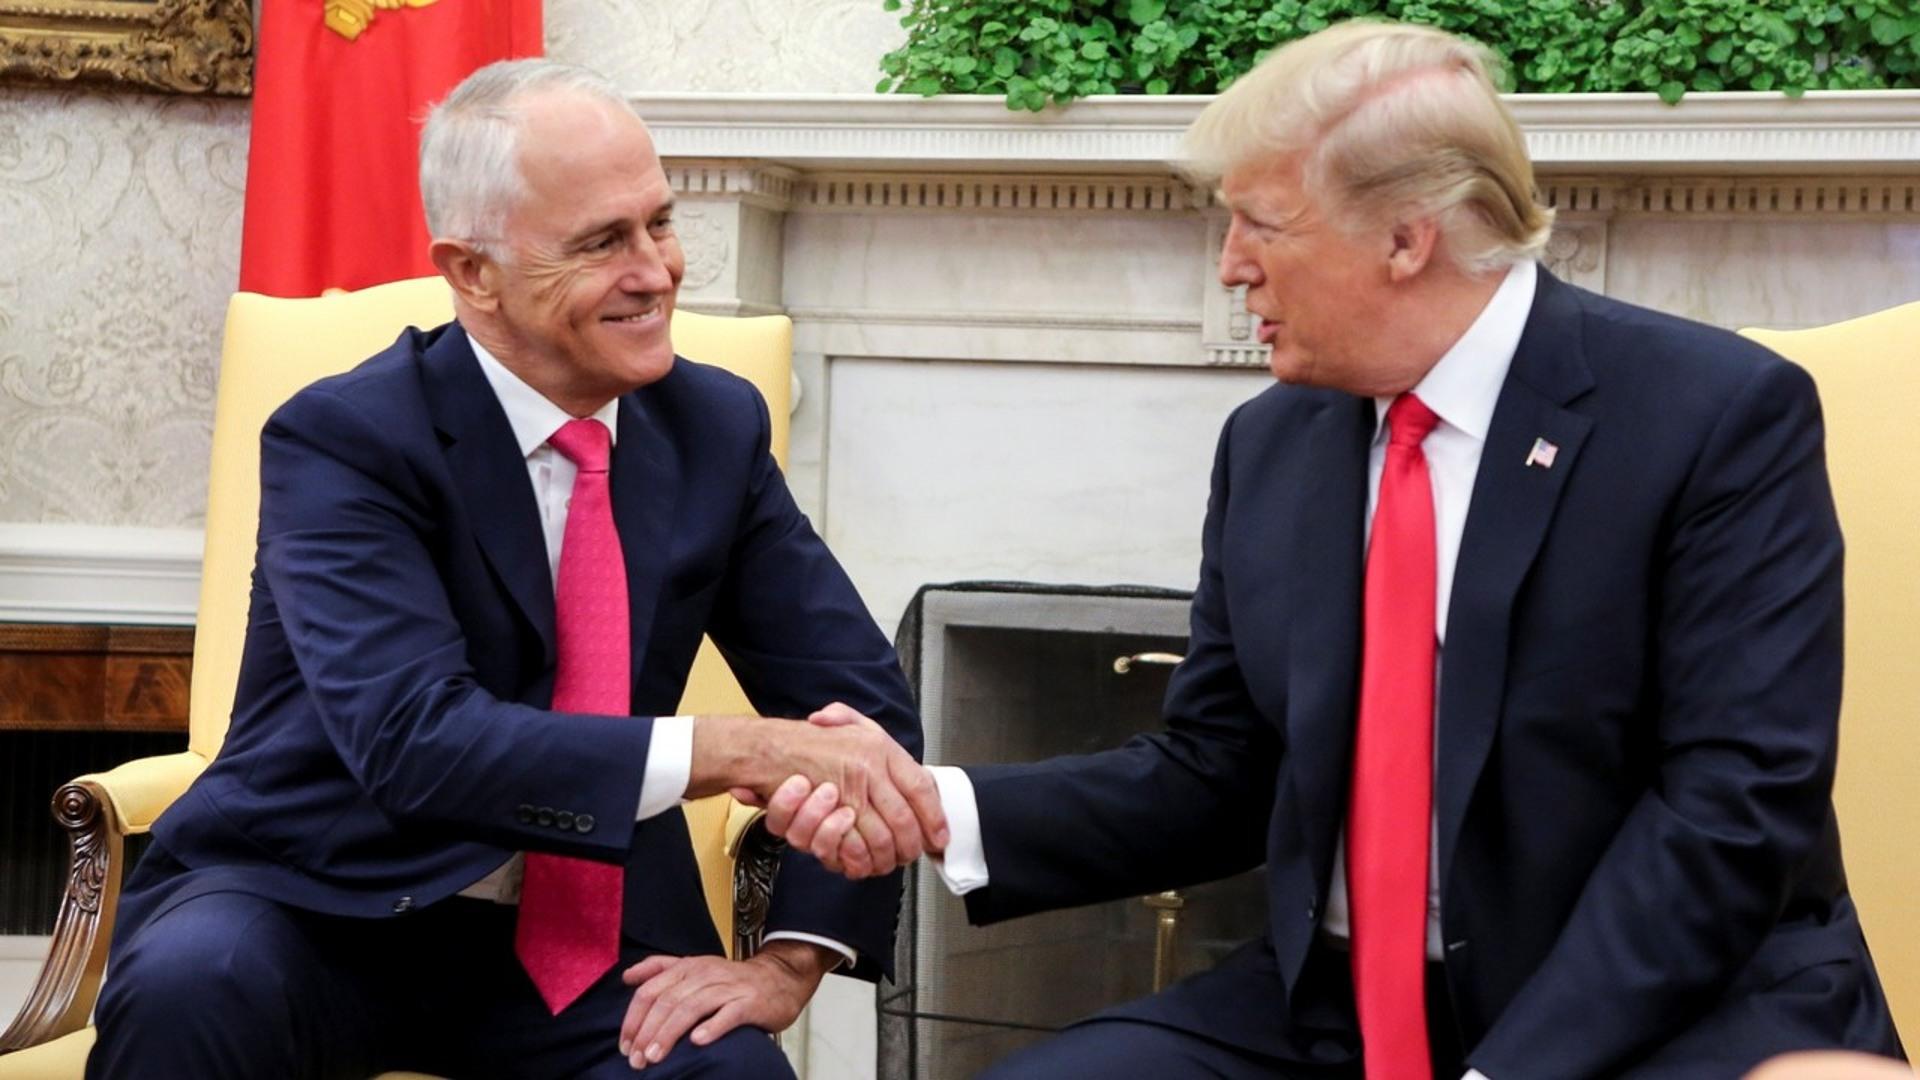 Turnbull Confident In Australias Tariff Exemption Sky News Australia